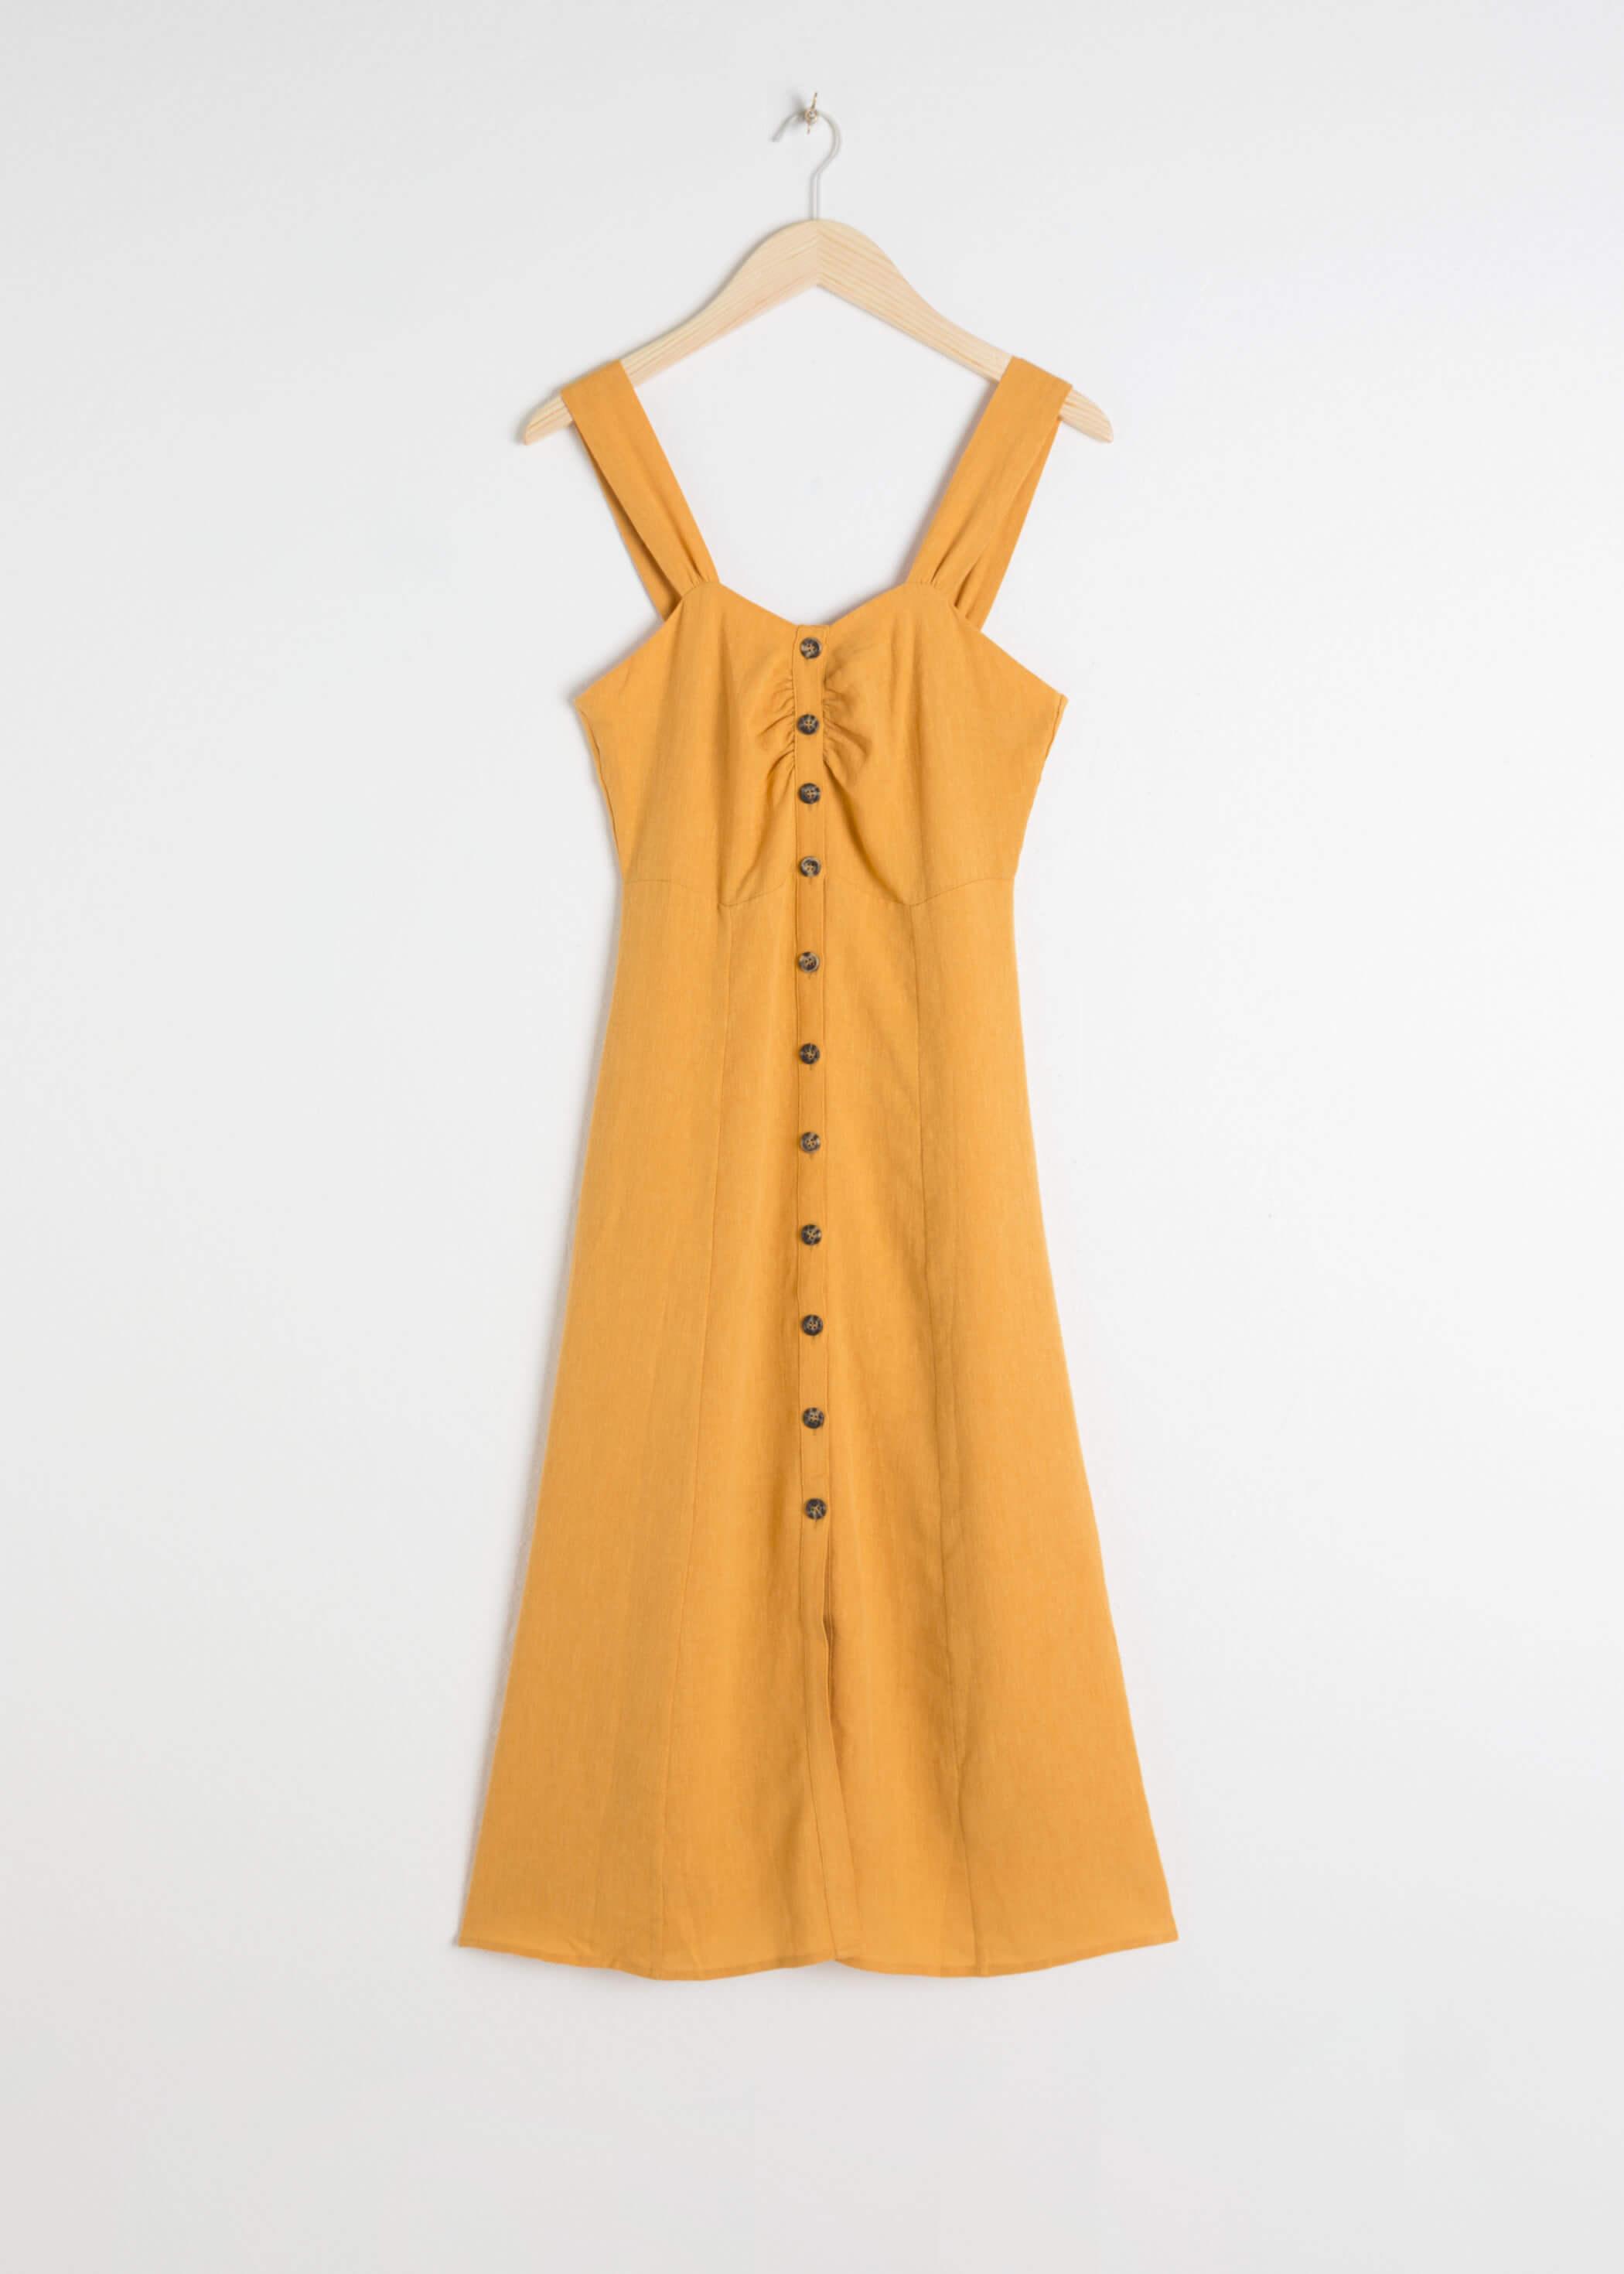 Vestido amarillo de Otherstories